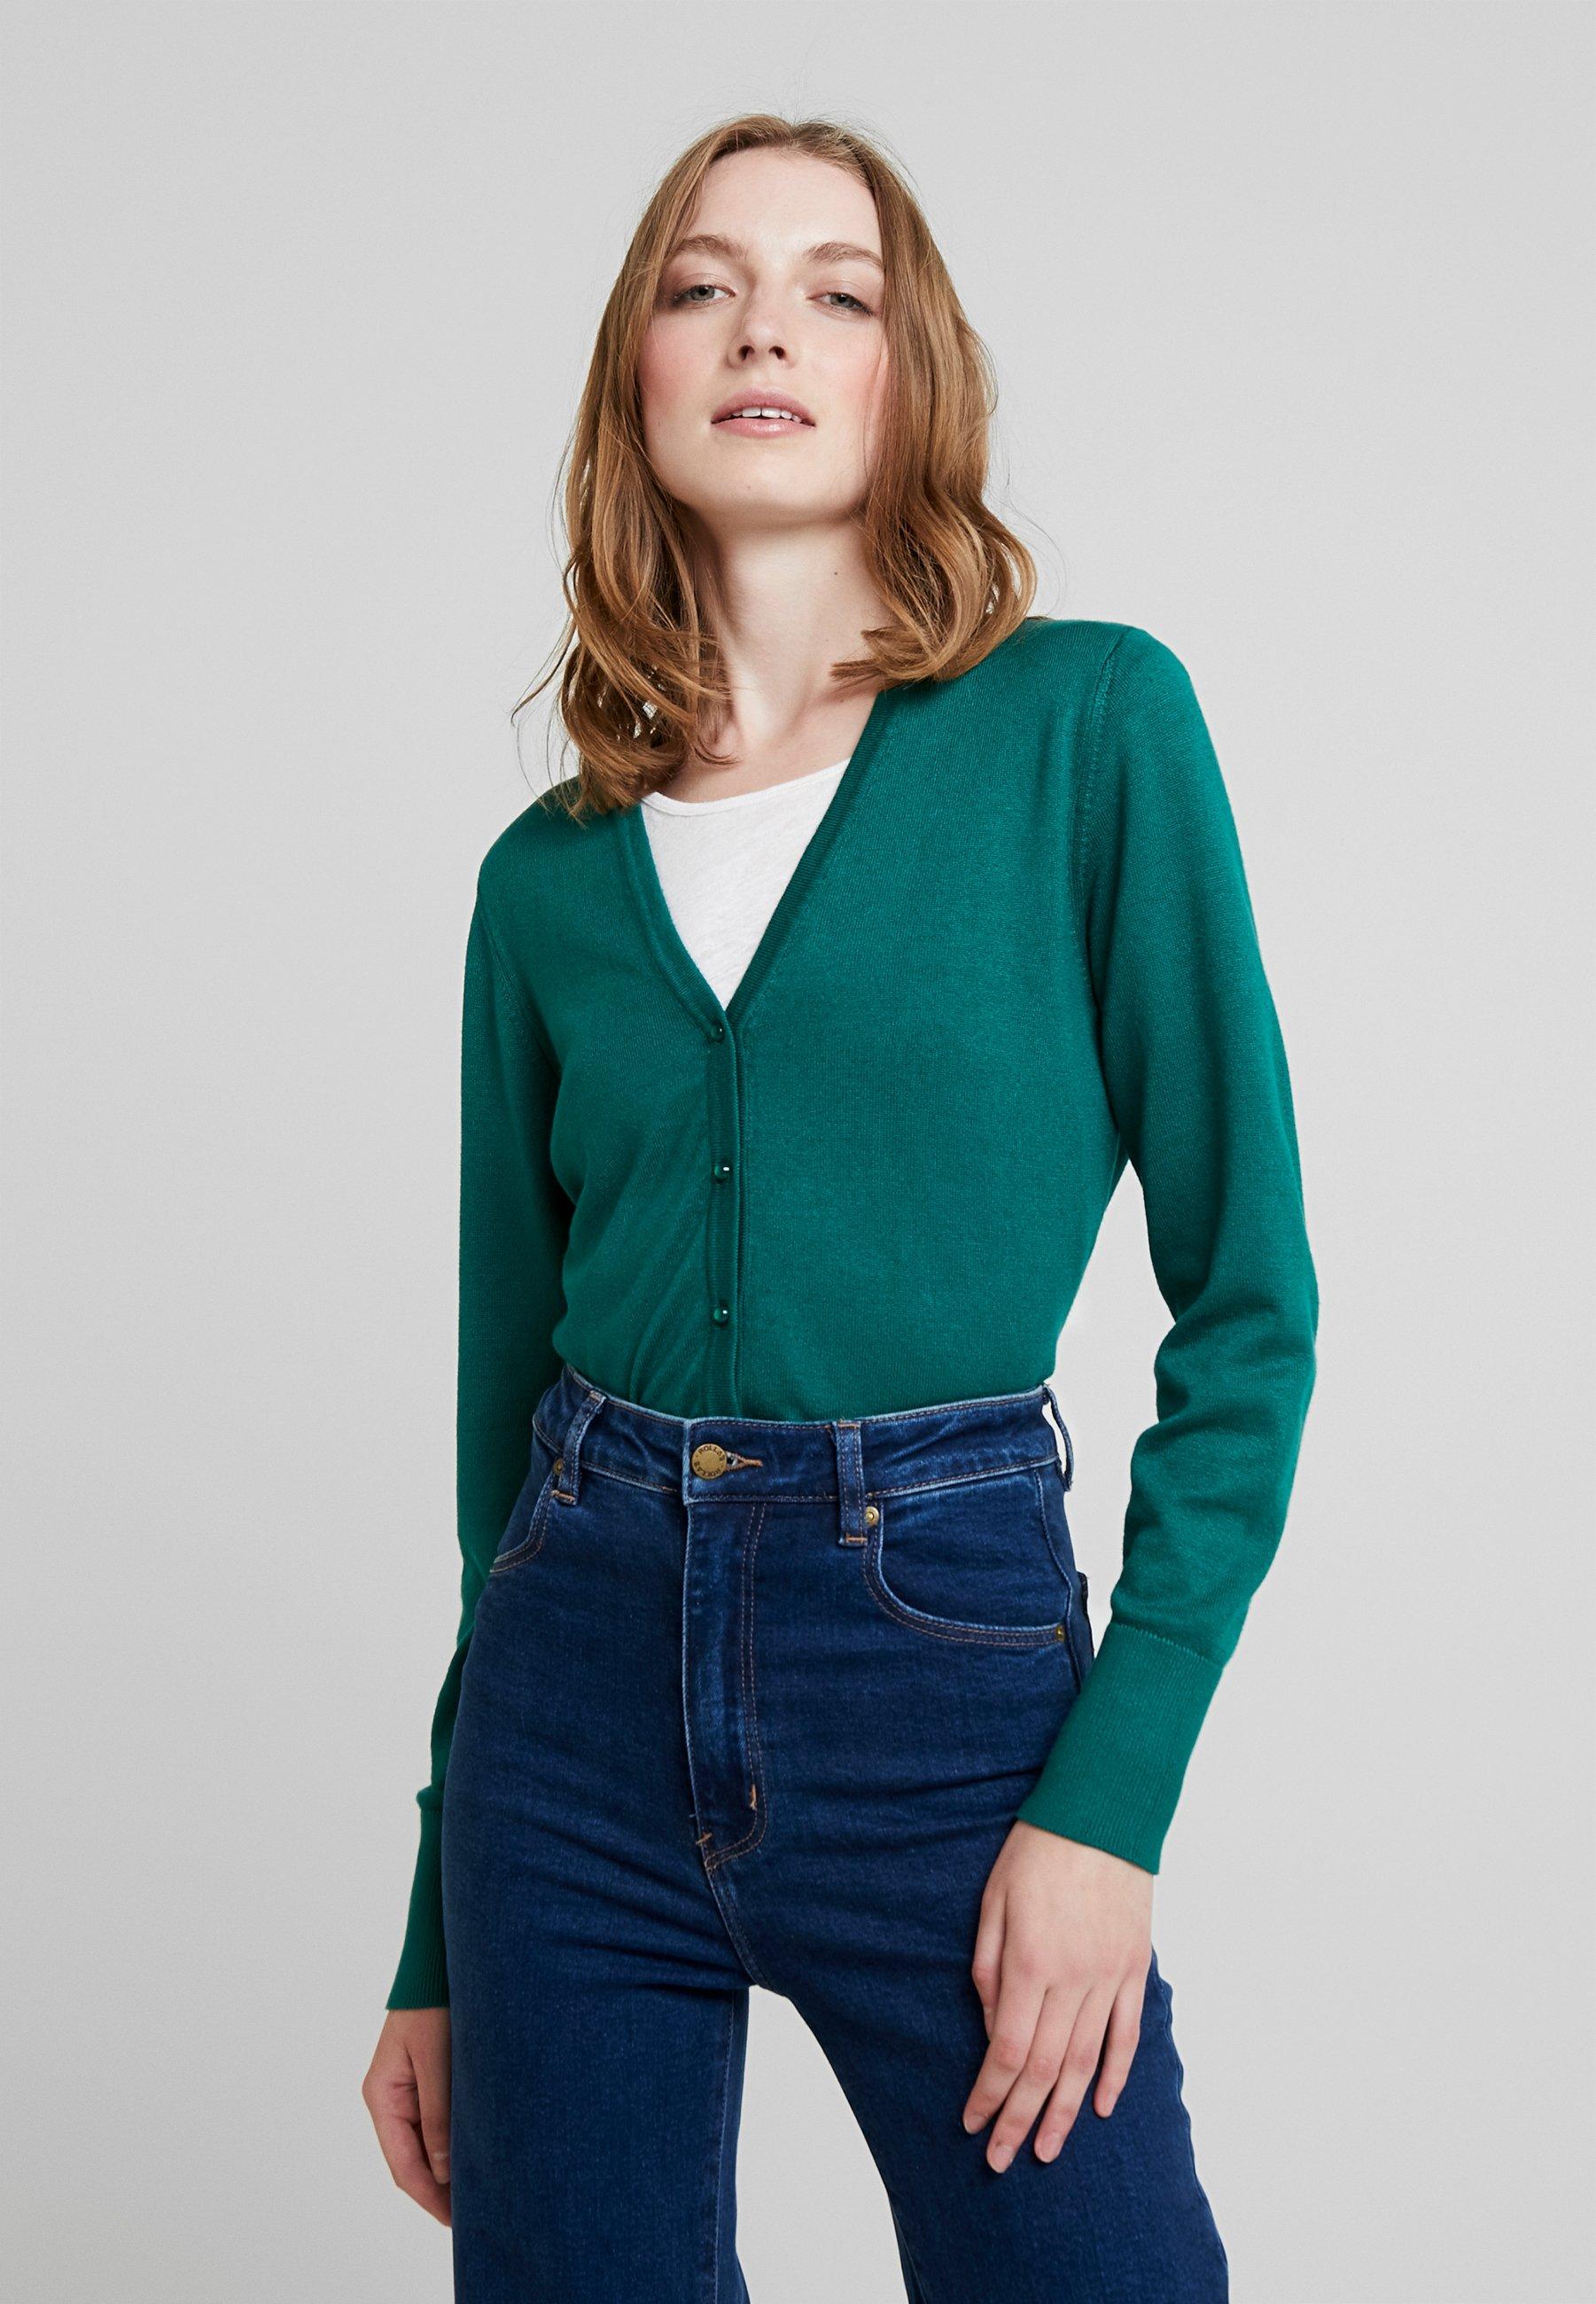 Emerald Green CardiganGilet Emerald Moreamp; CardiganGilet Moreamp; Emerald Green CardiganGilet Moreamp; kwP80OnX